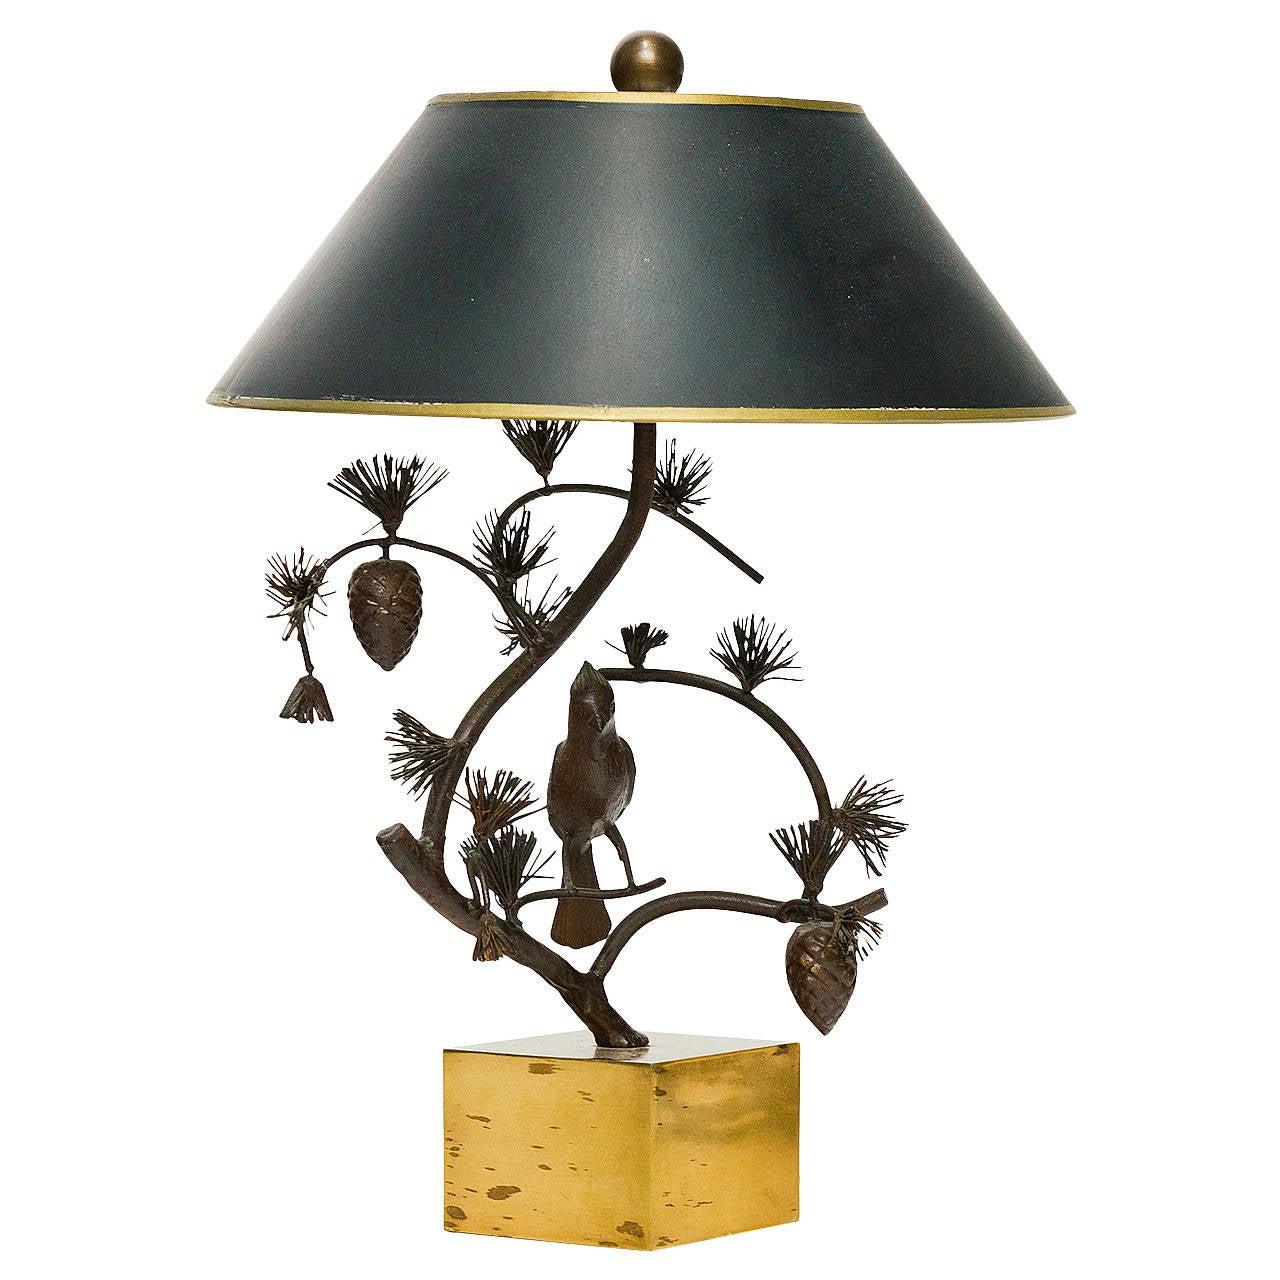 Chapman Bird Lamp at 1stdibs